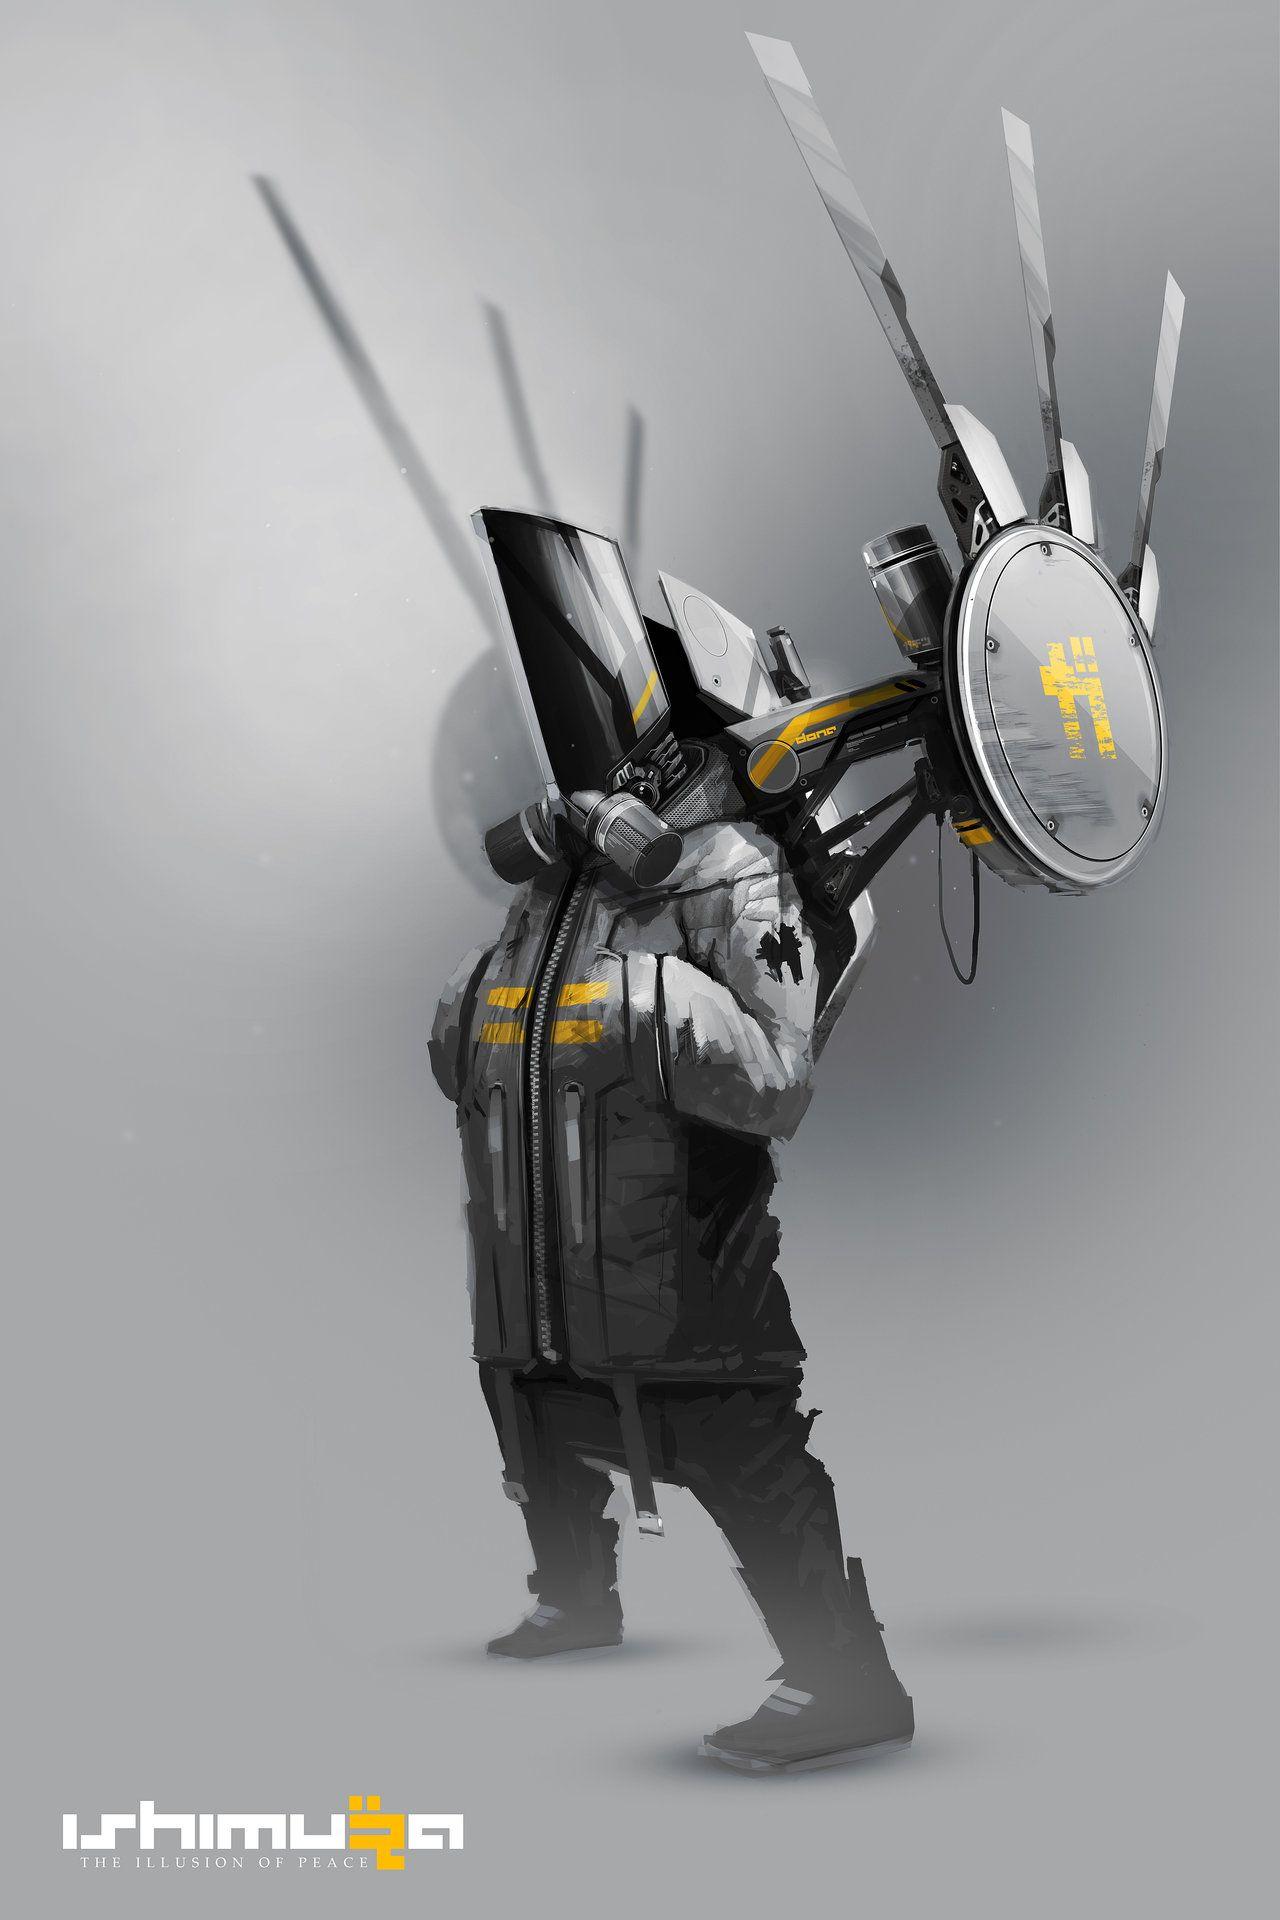 ArtStation - ISHIMURA, DAYTONER / Daniel Hahn